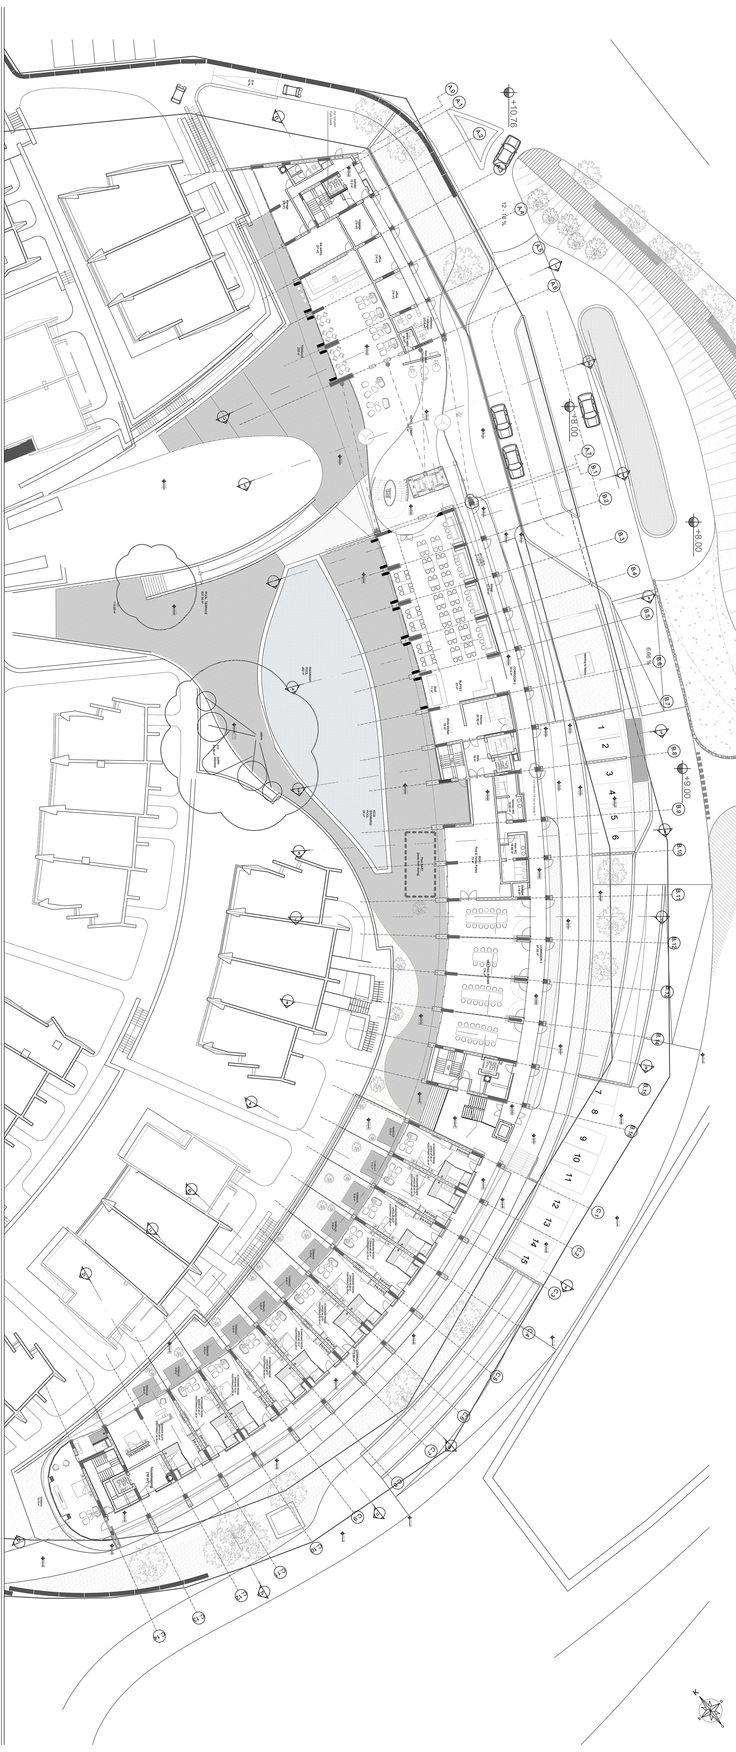 This main axis structures the development and serves as a back-spine of the site's circulation. Gokhan Avcioglu GAD Architecture #hotel #hoteldesign #architecture #architecturaldrawing #GADarchitecture #GAD #interiordesign #turkey #swissotel #turkiye #architect #mimar #mimarlik #pool #plans #villa #bodrum #luxury #largeimage #gokhanavcioglu #gadarchitecture #gadfoundation